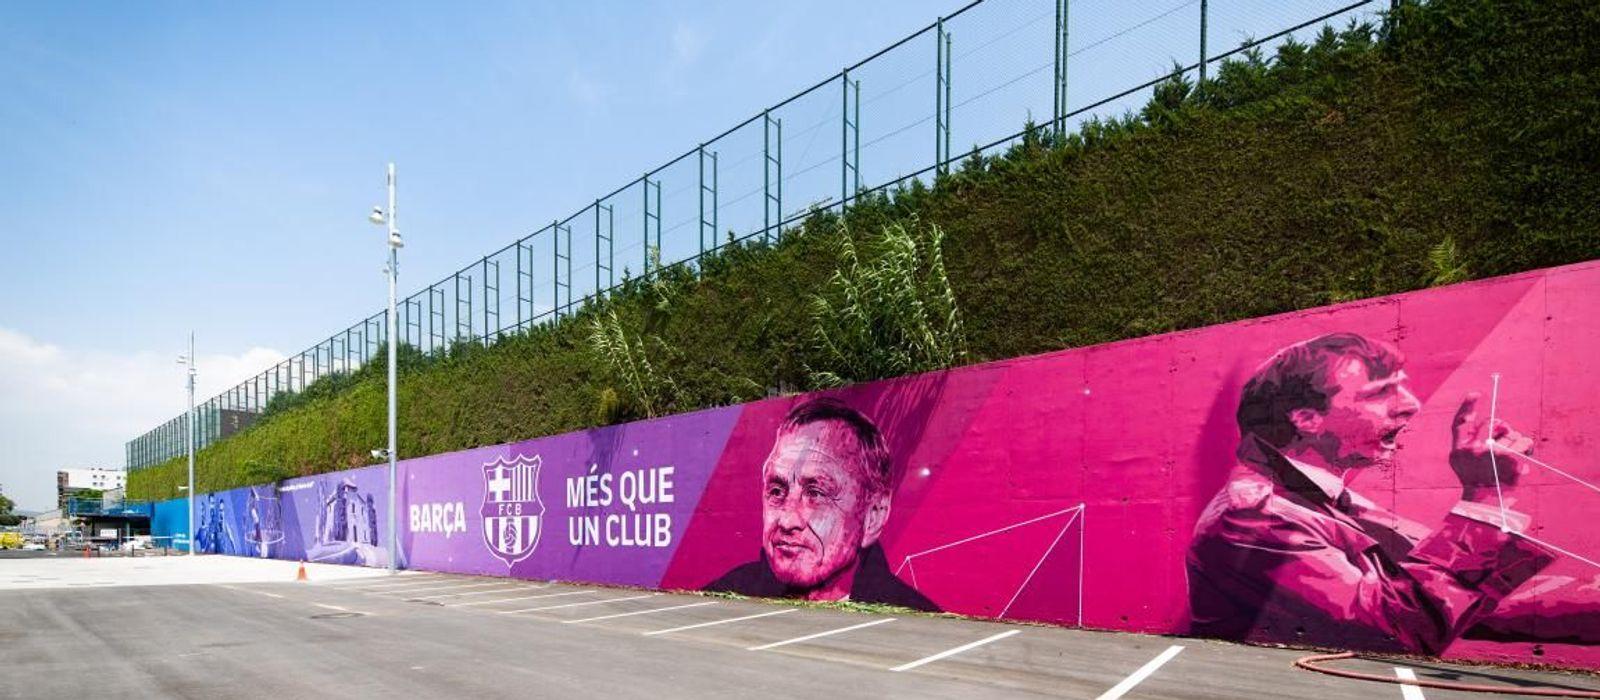 New Johan Cruyff inspired mural at the Ciutat Esportiva